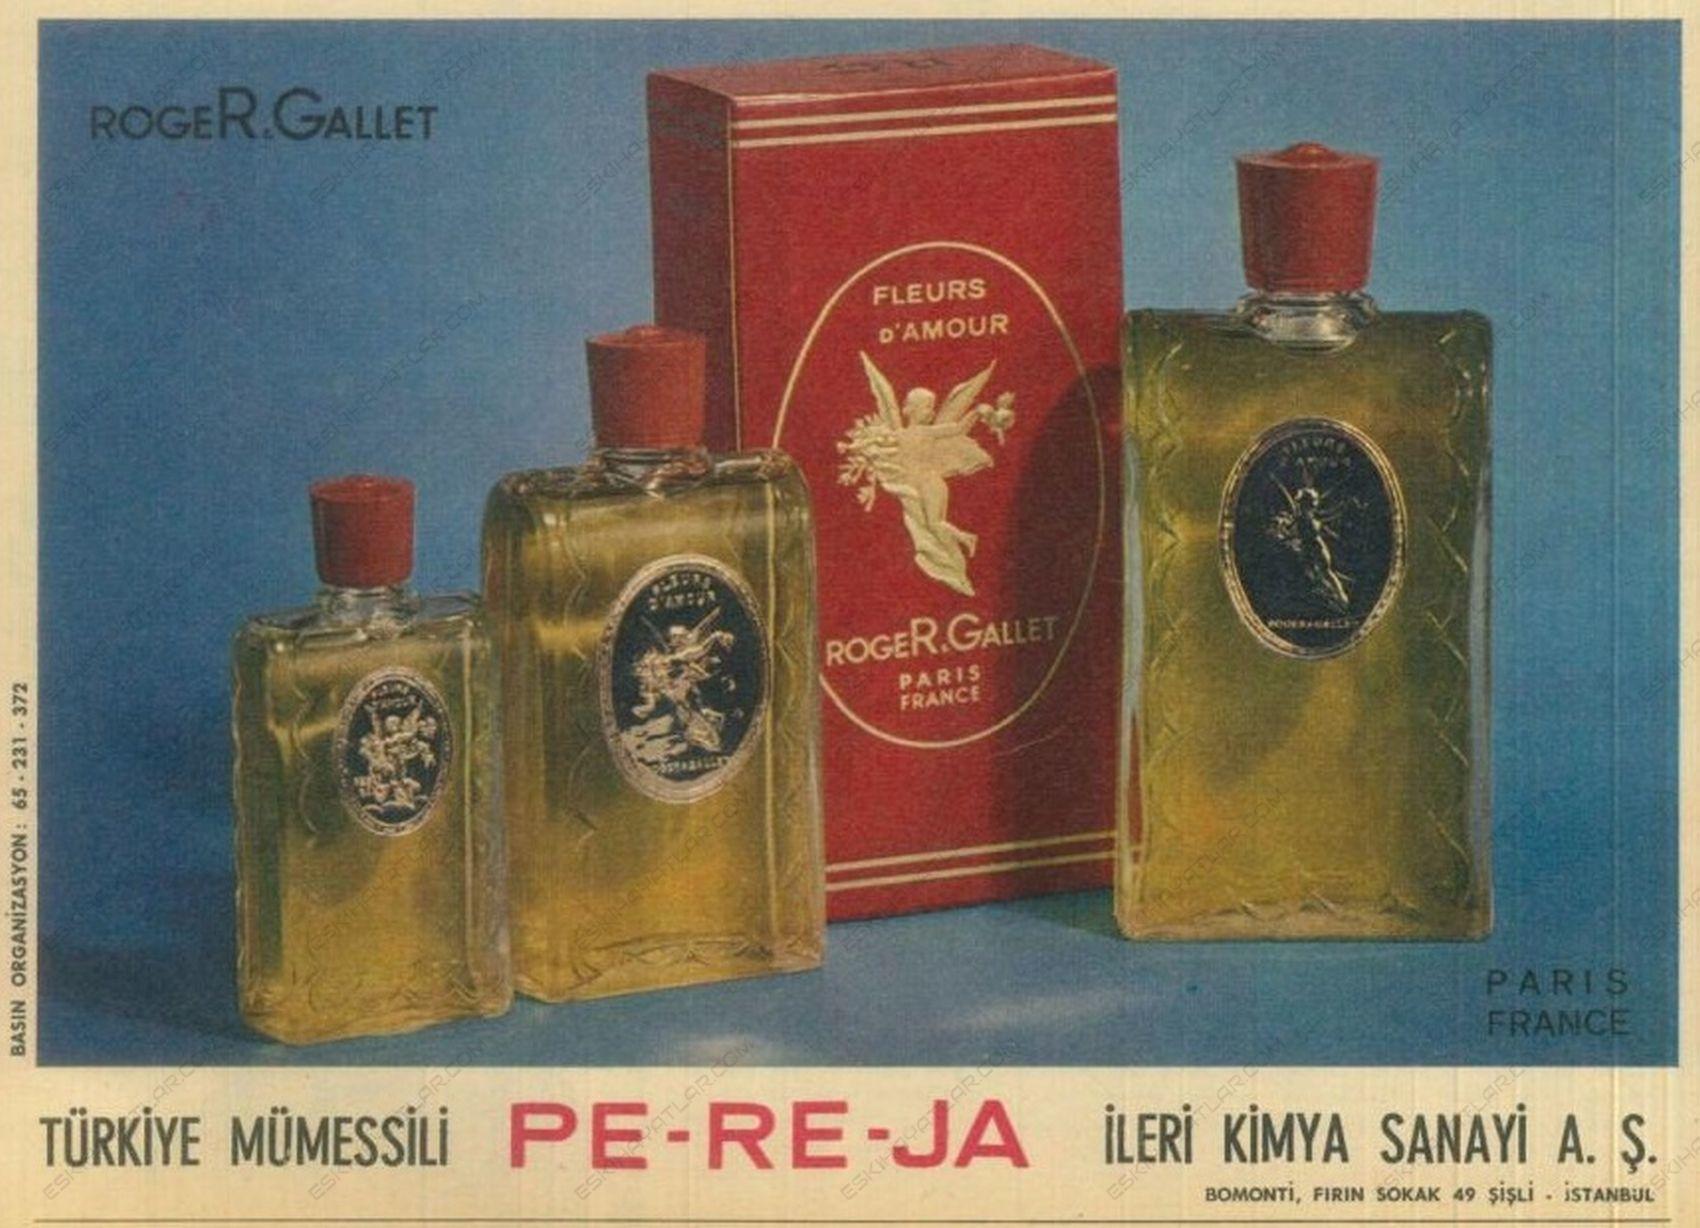 0424-roger-gallet-parfum-reklami-1965-pe-re-ja-ileri-kimya-sanayi